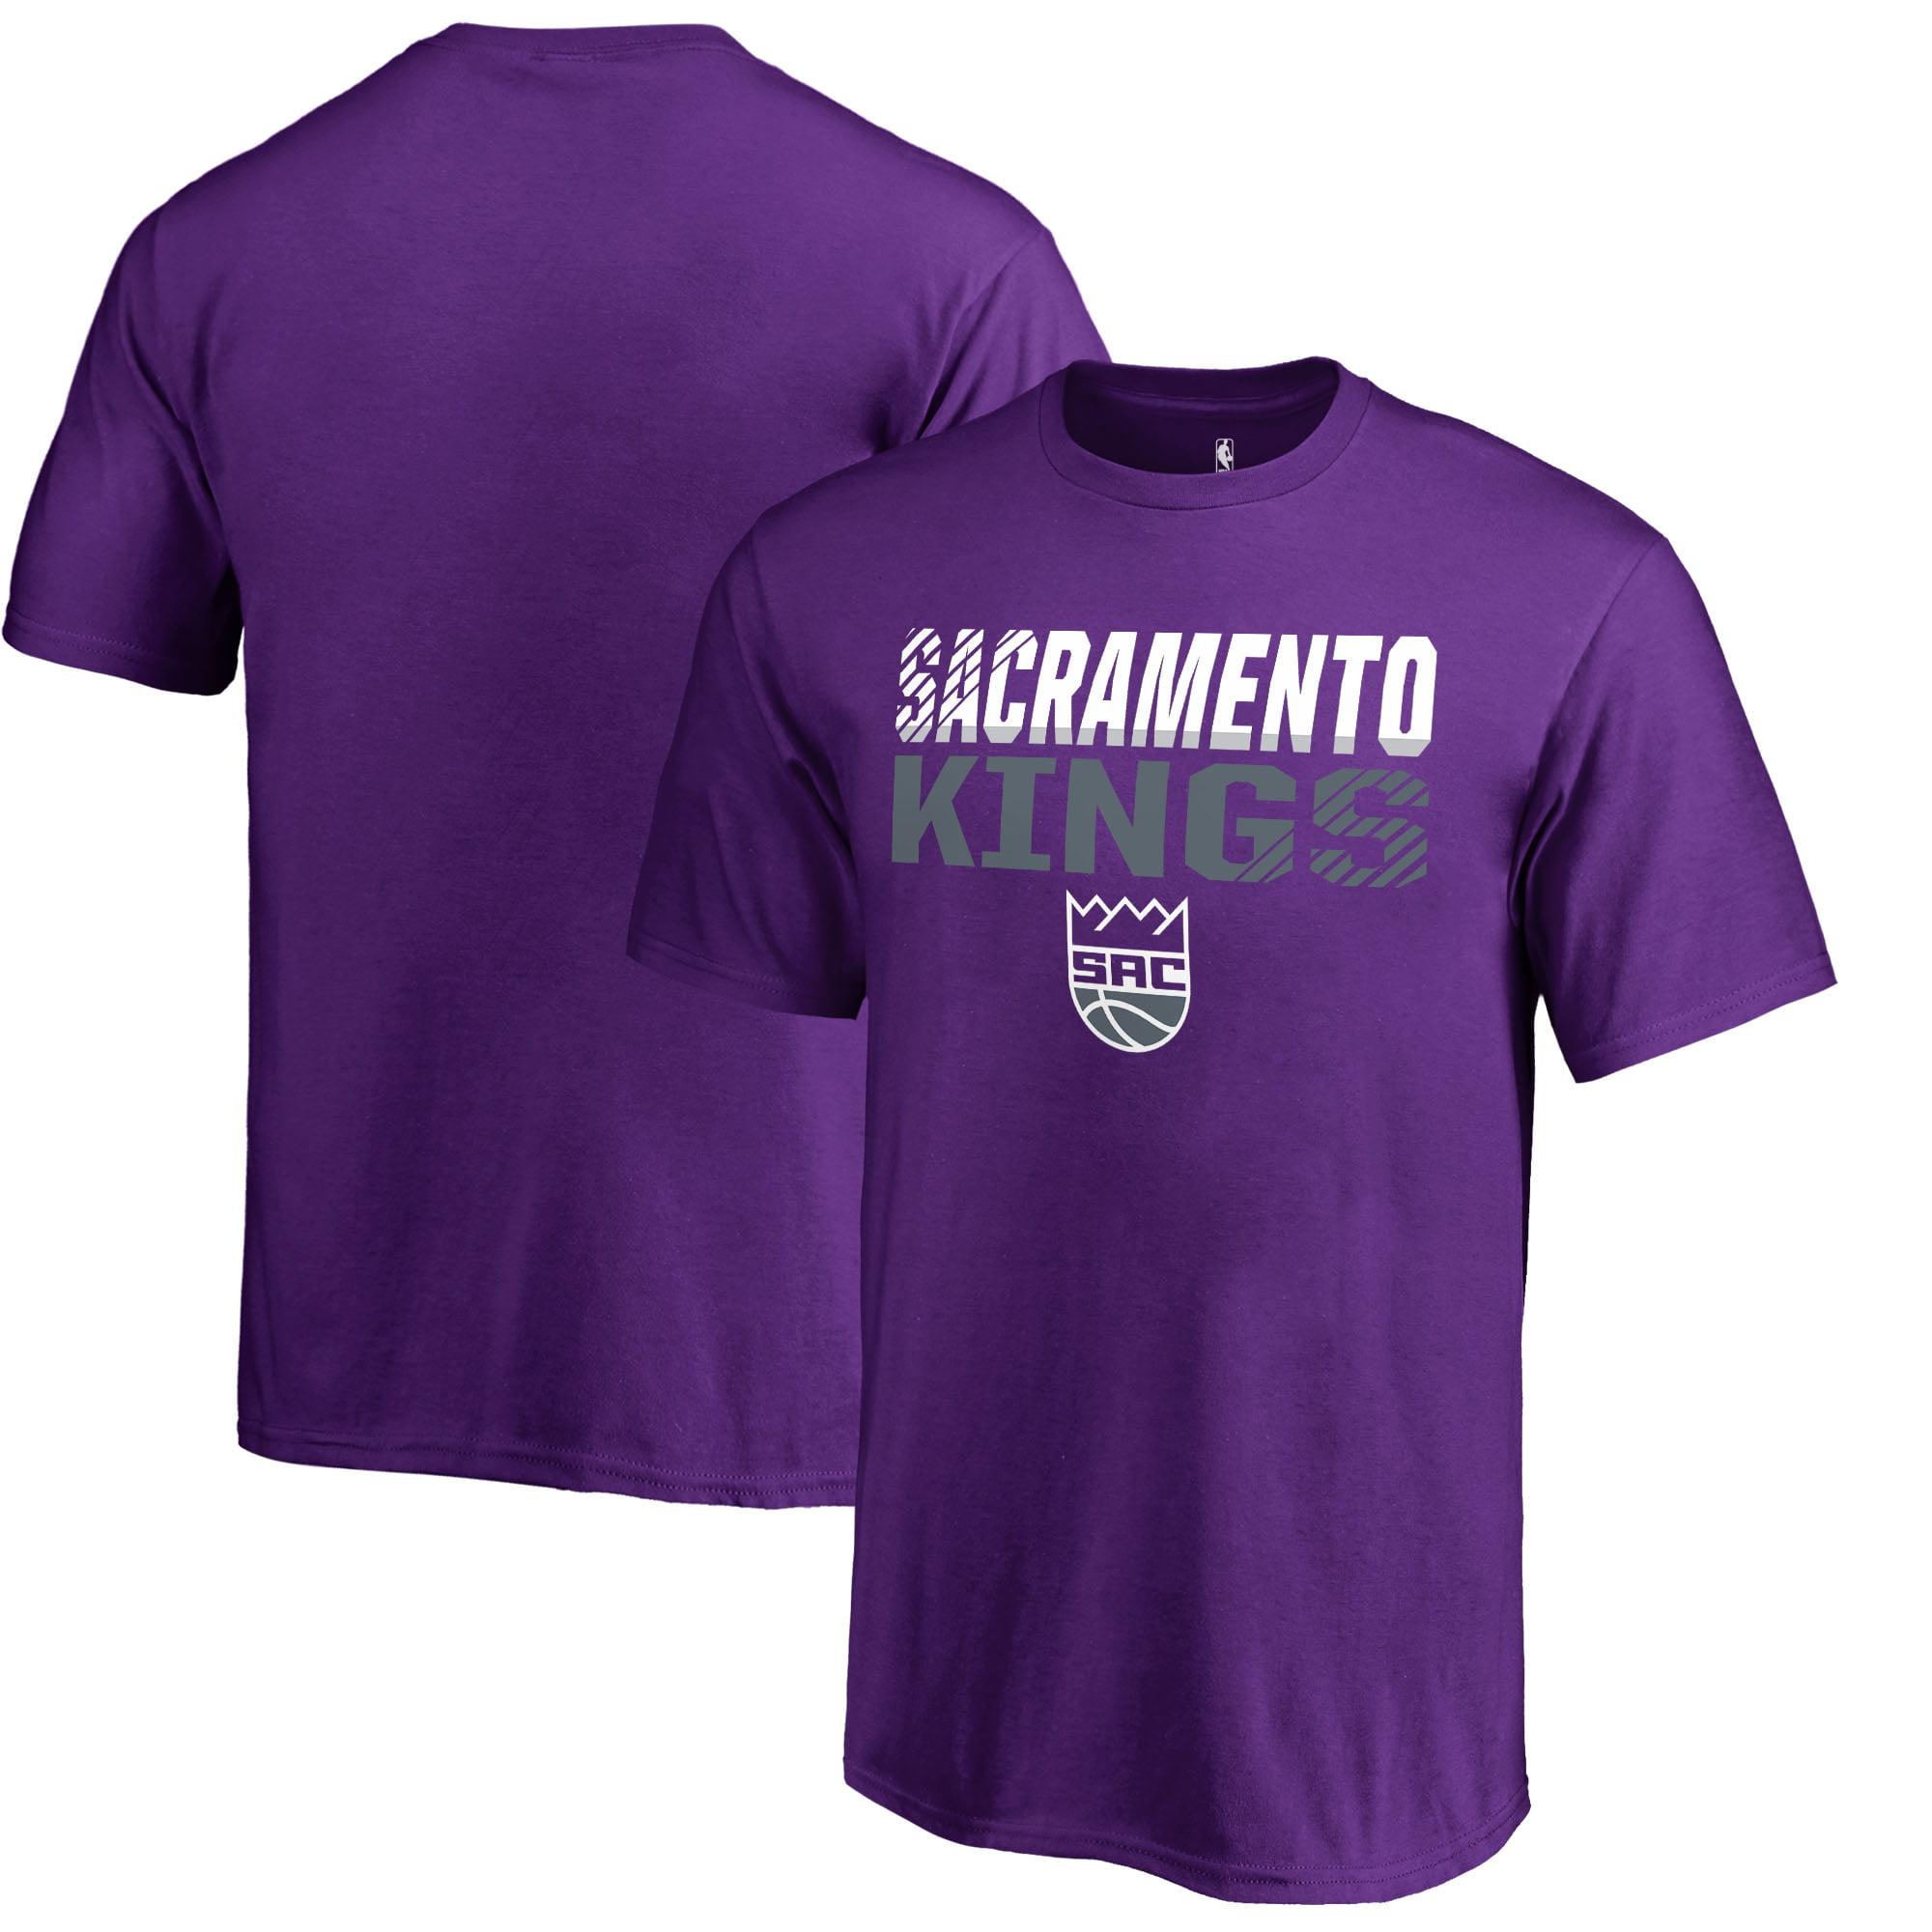 Sacramento Kings Fanatics Branded Youth Fade Out T-Shirt - Purple